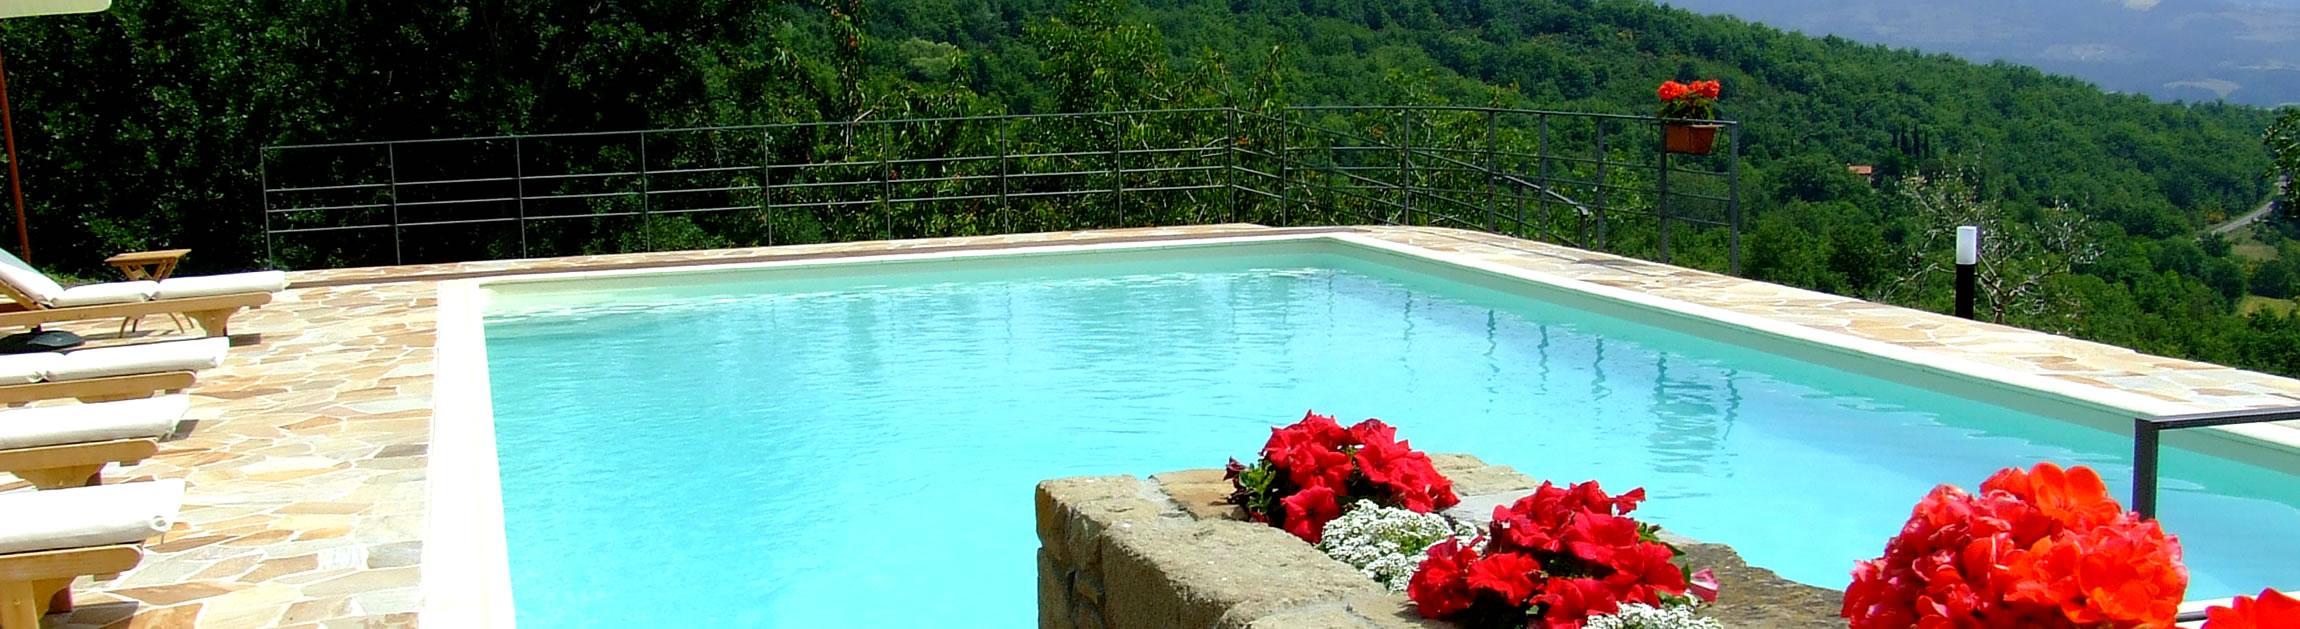 villa_pool_toskana_tita3